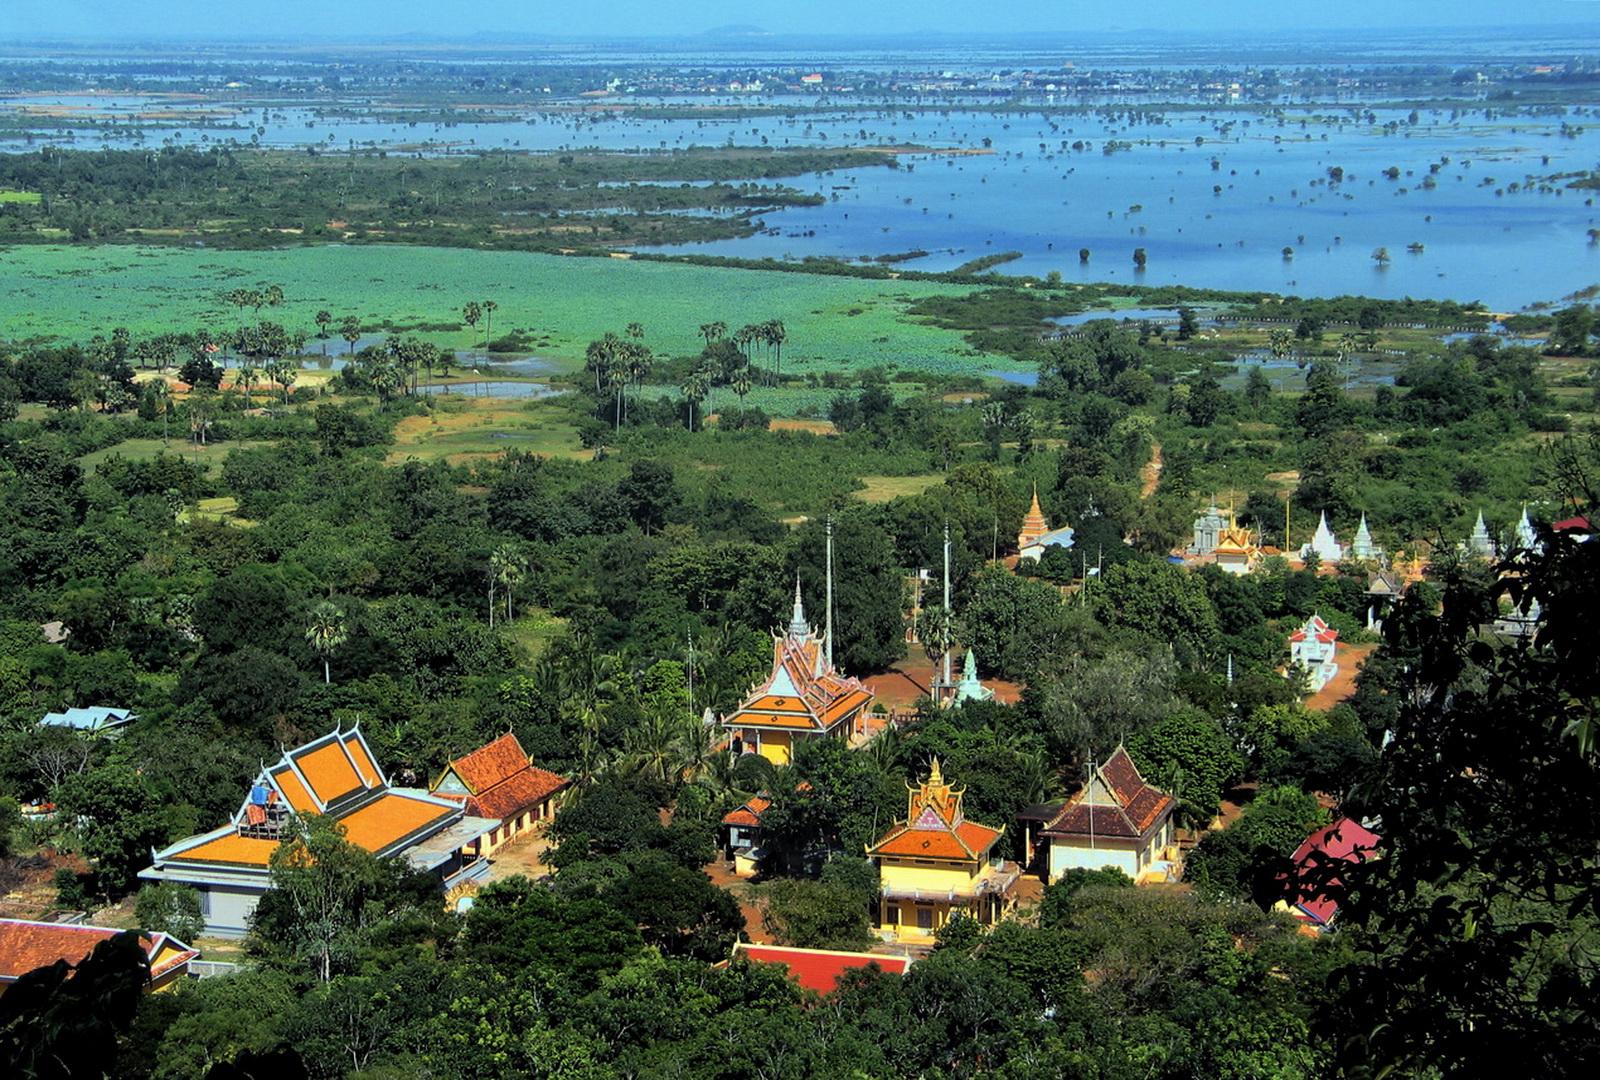 Cambodia, Saigon to Angkor, Udong